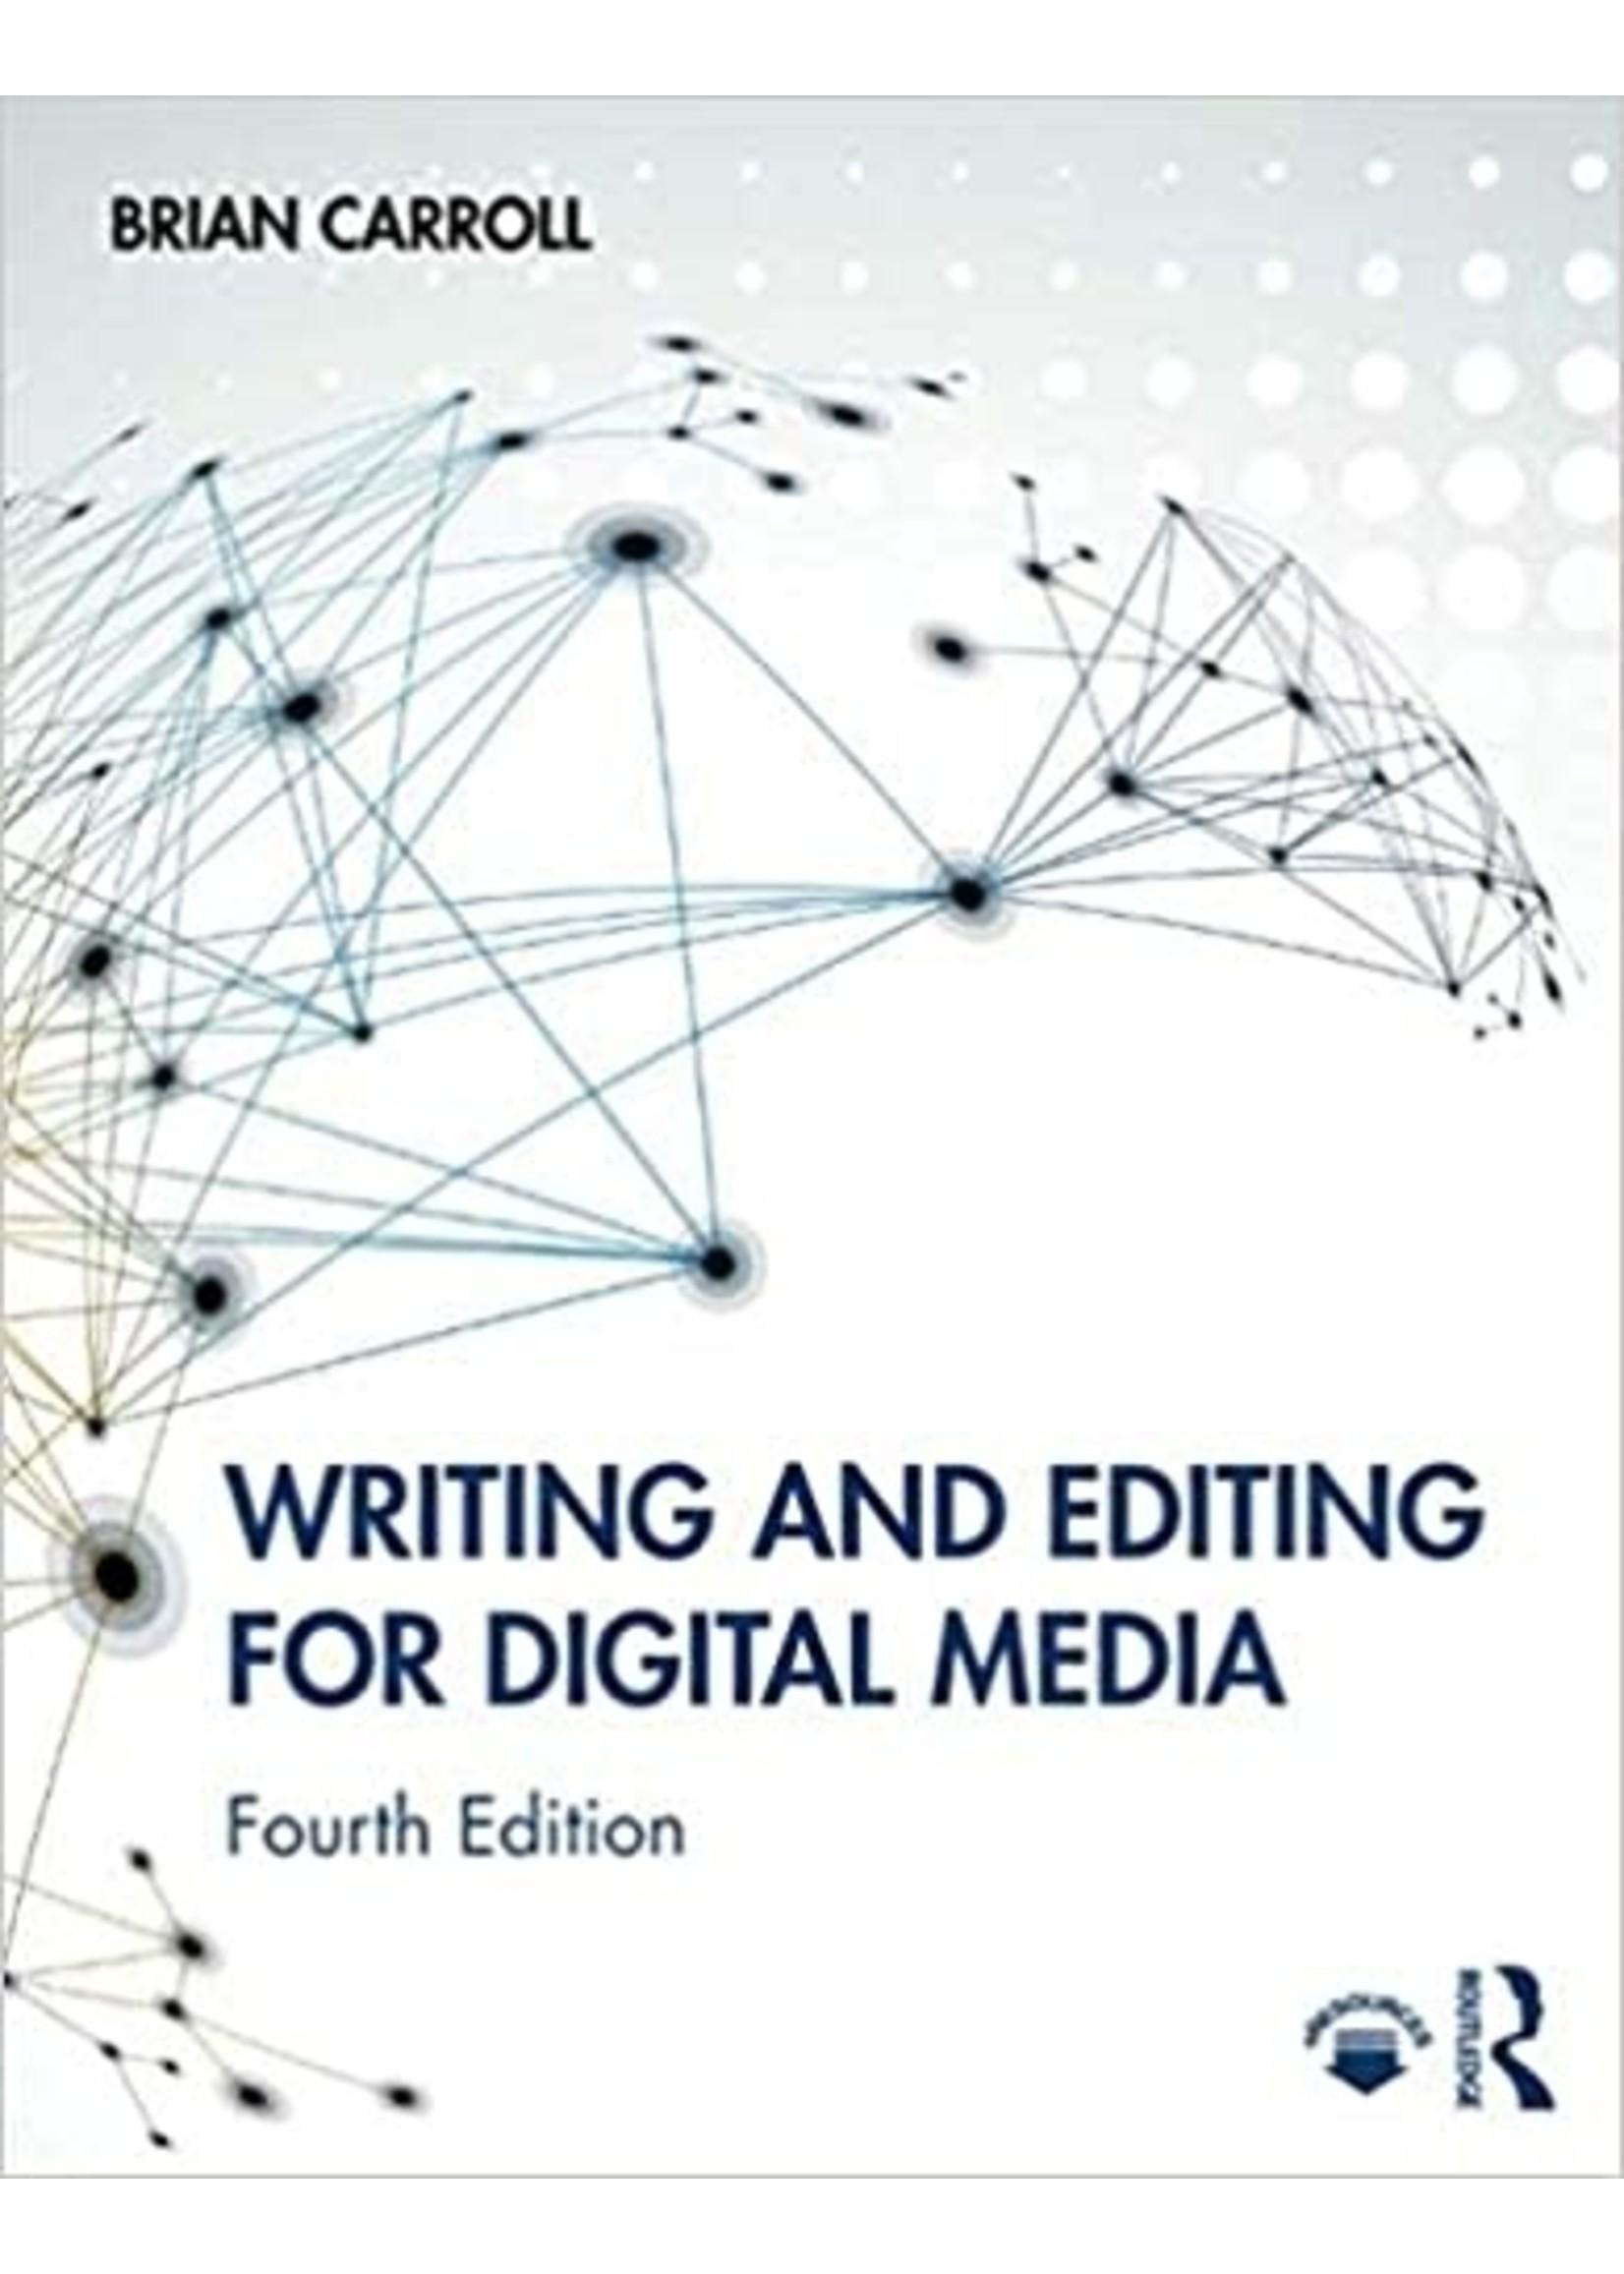 MC305 WRITING + EDITING FOR DIGITAL MEDIA